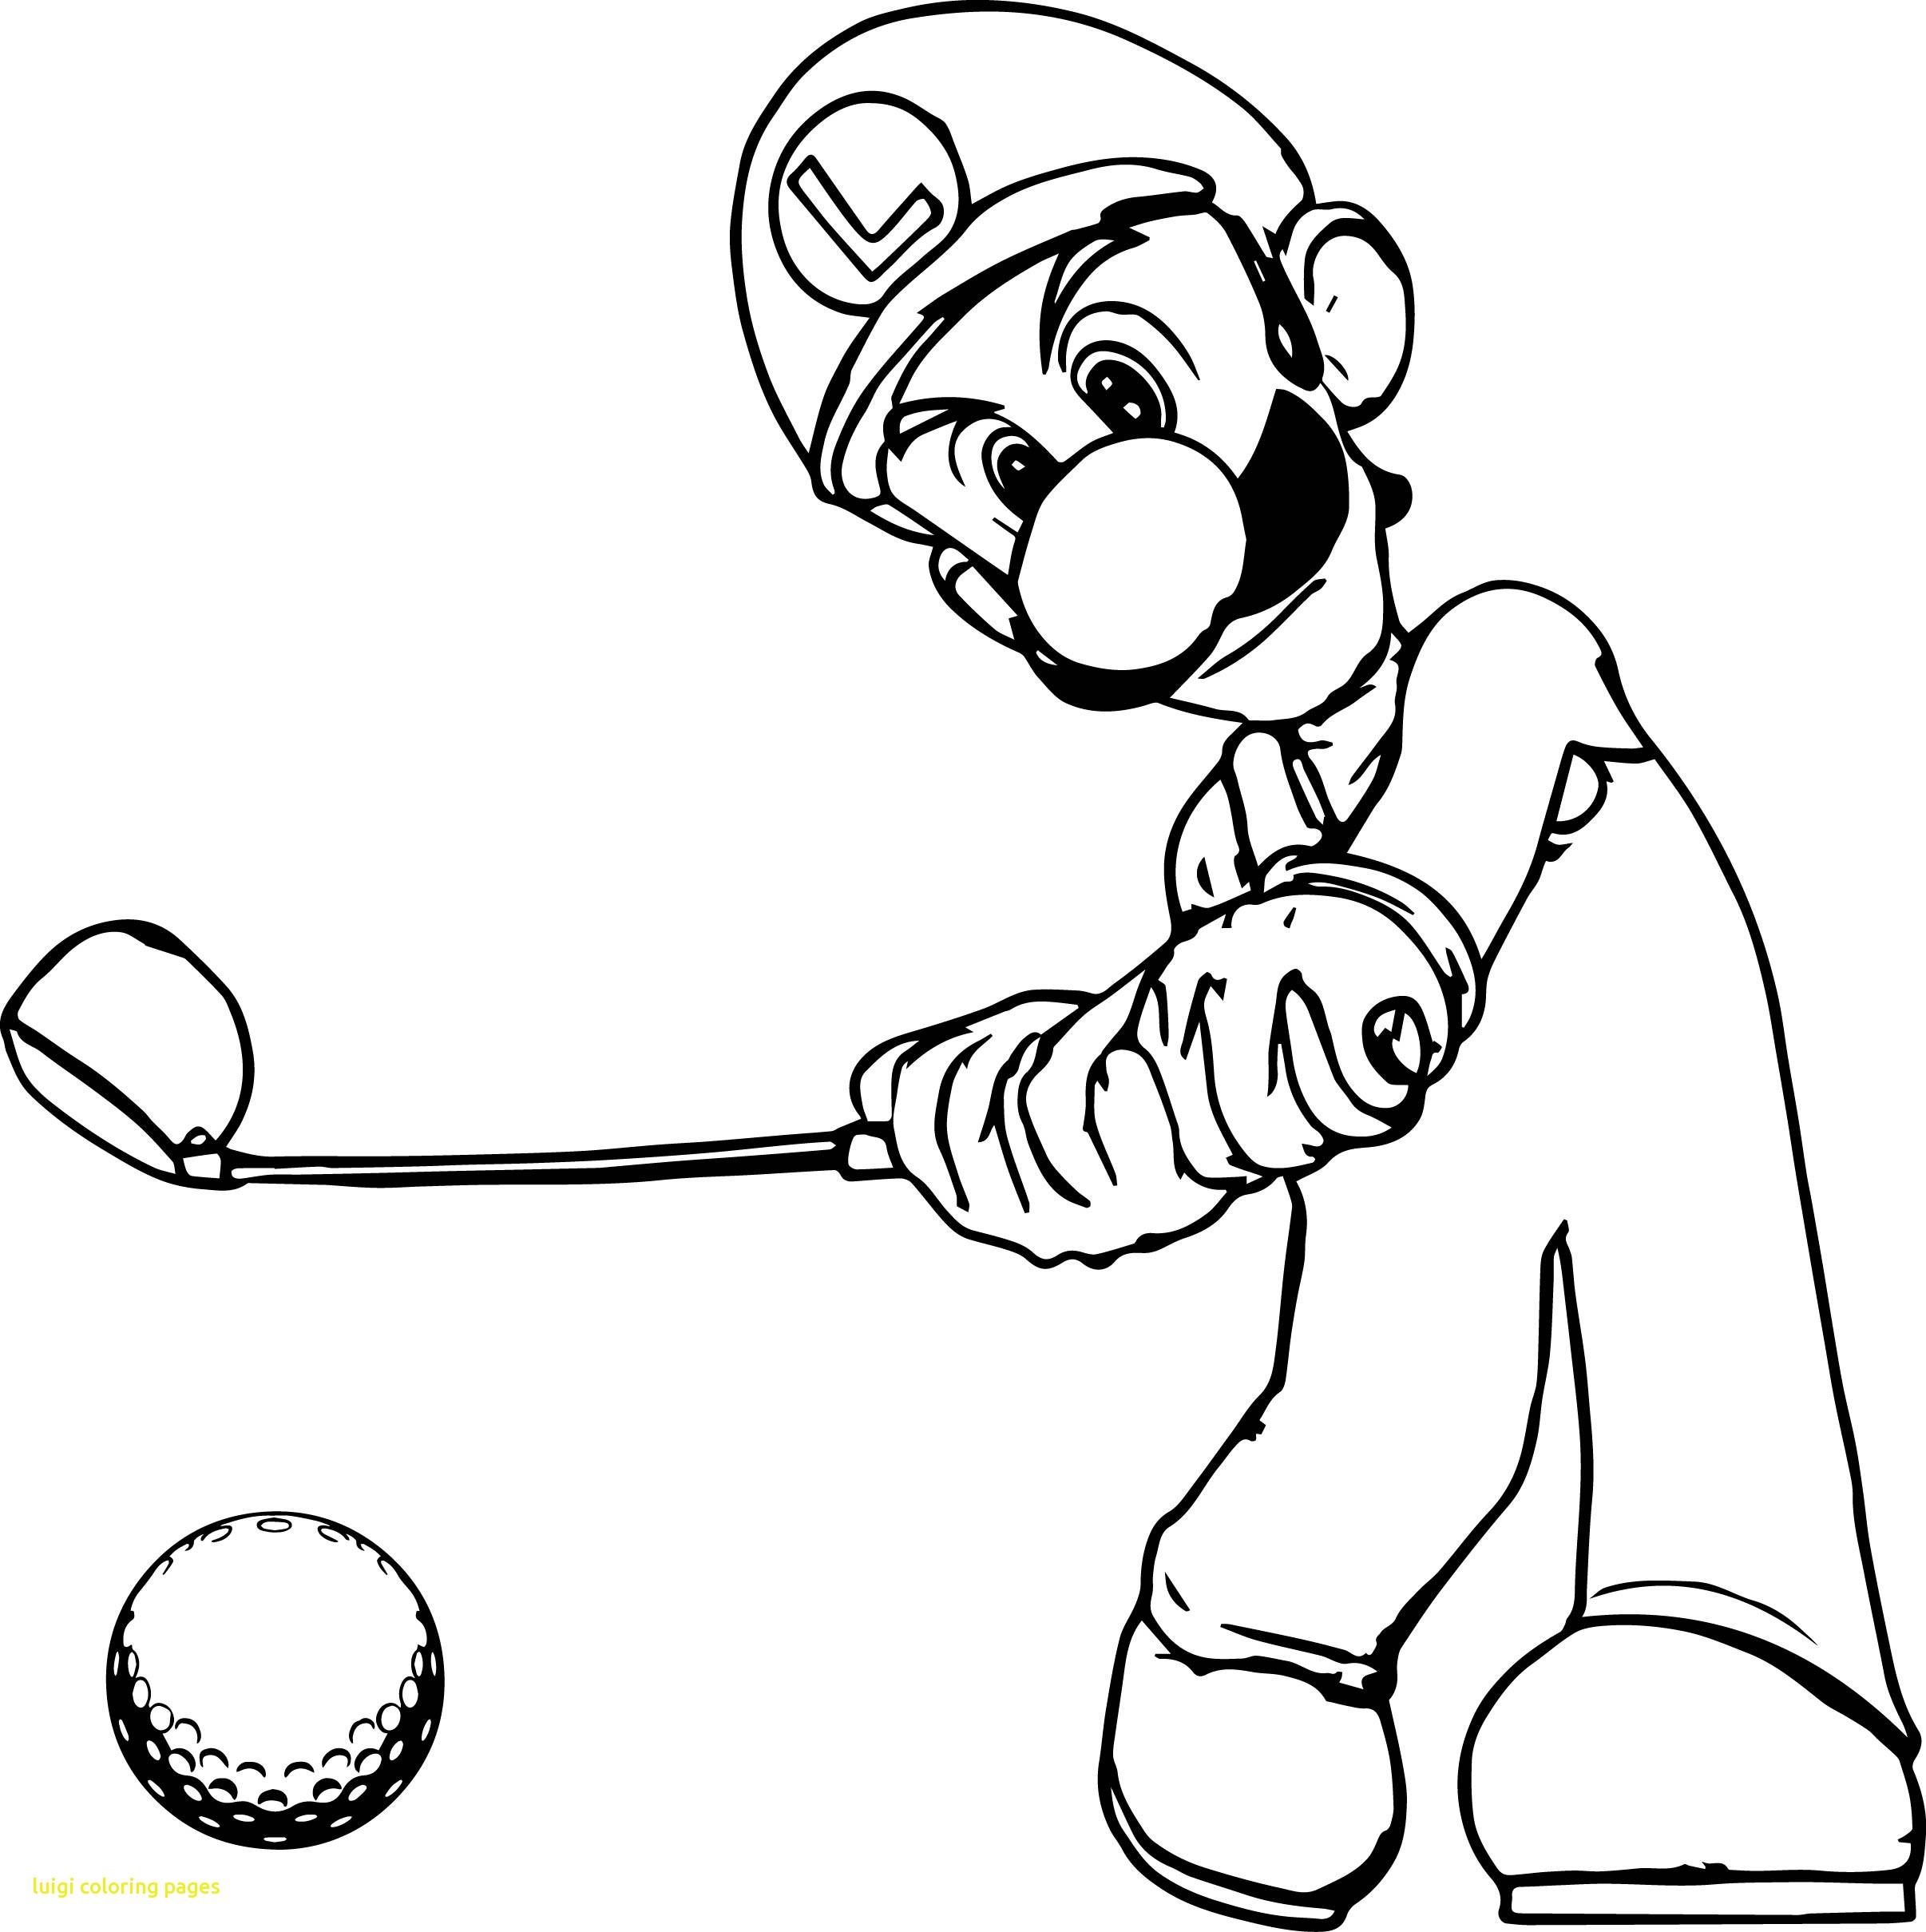 2412x2419 Luigi Coloring Pages With Super Mario Golf Page Ribsvigyapan Luigi